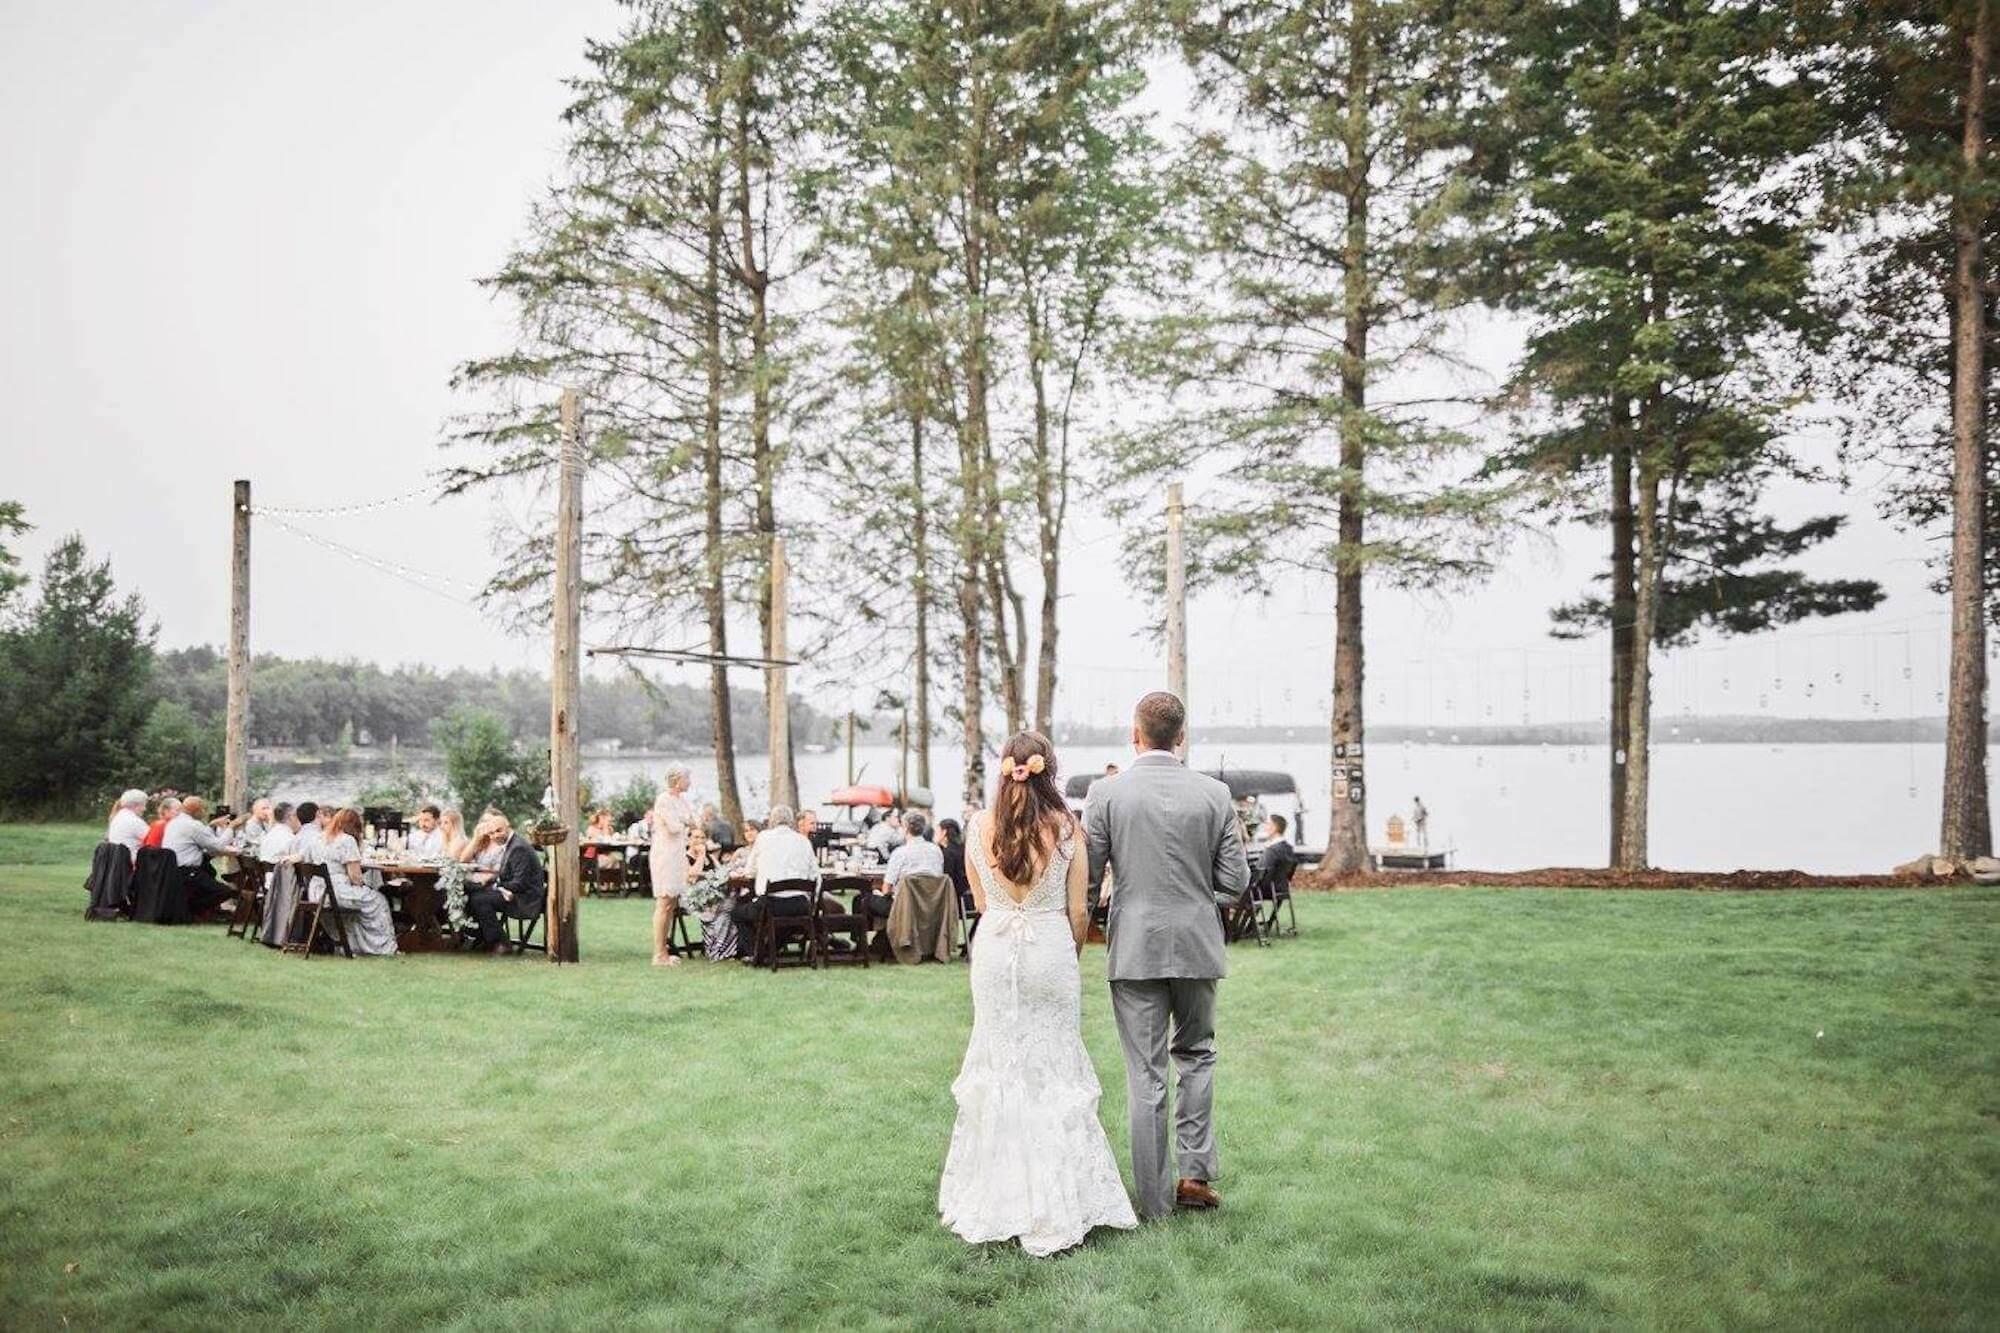 engle-olson-wedding-video-perry-james-photography-46.jpg